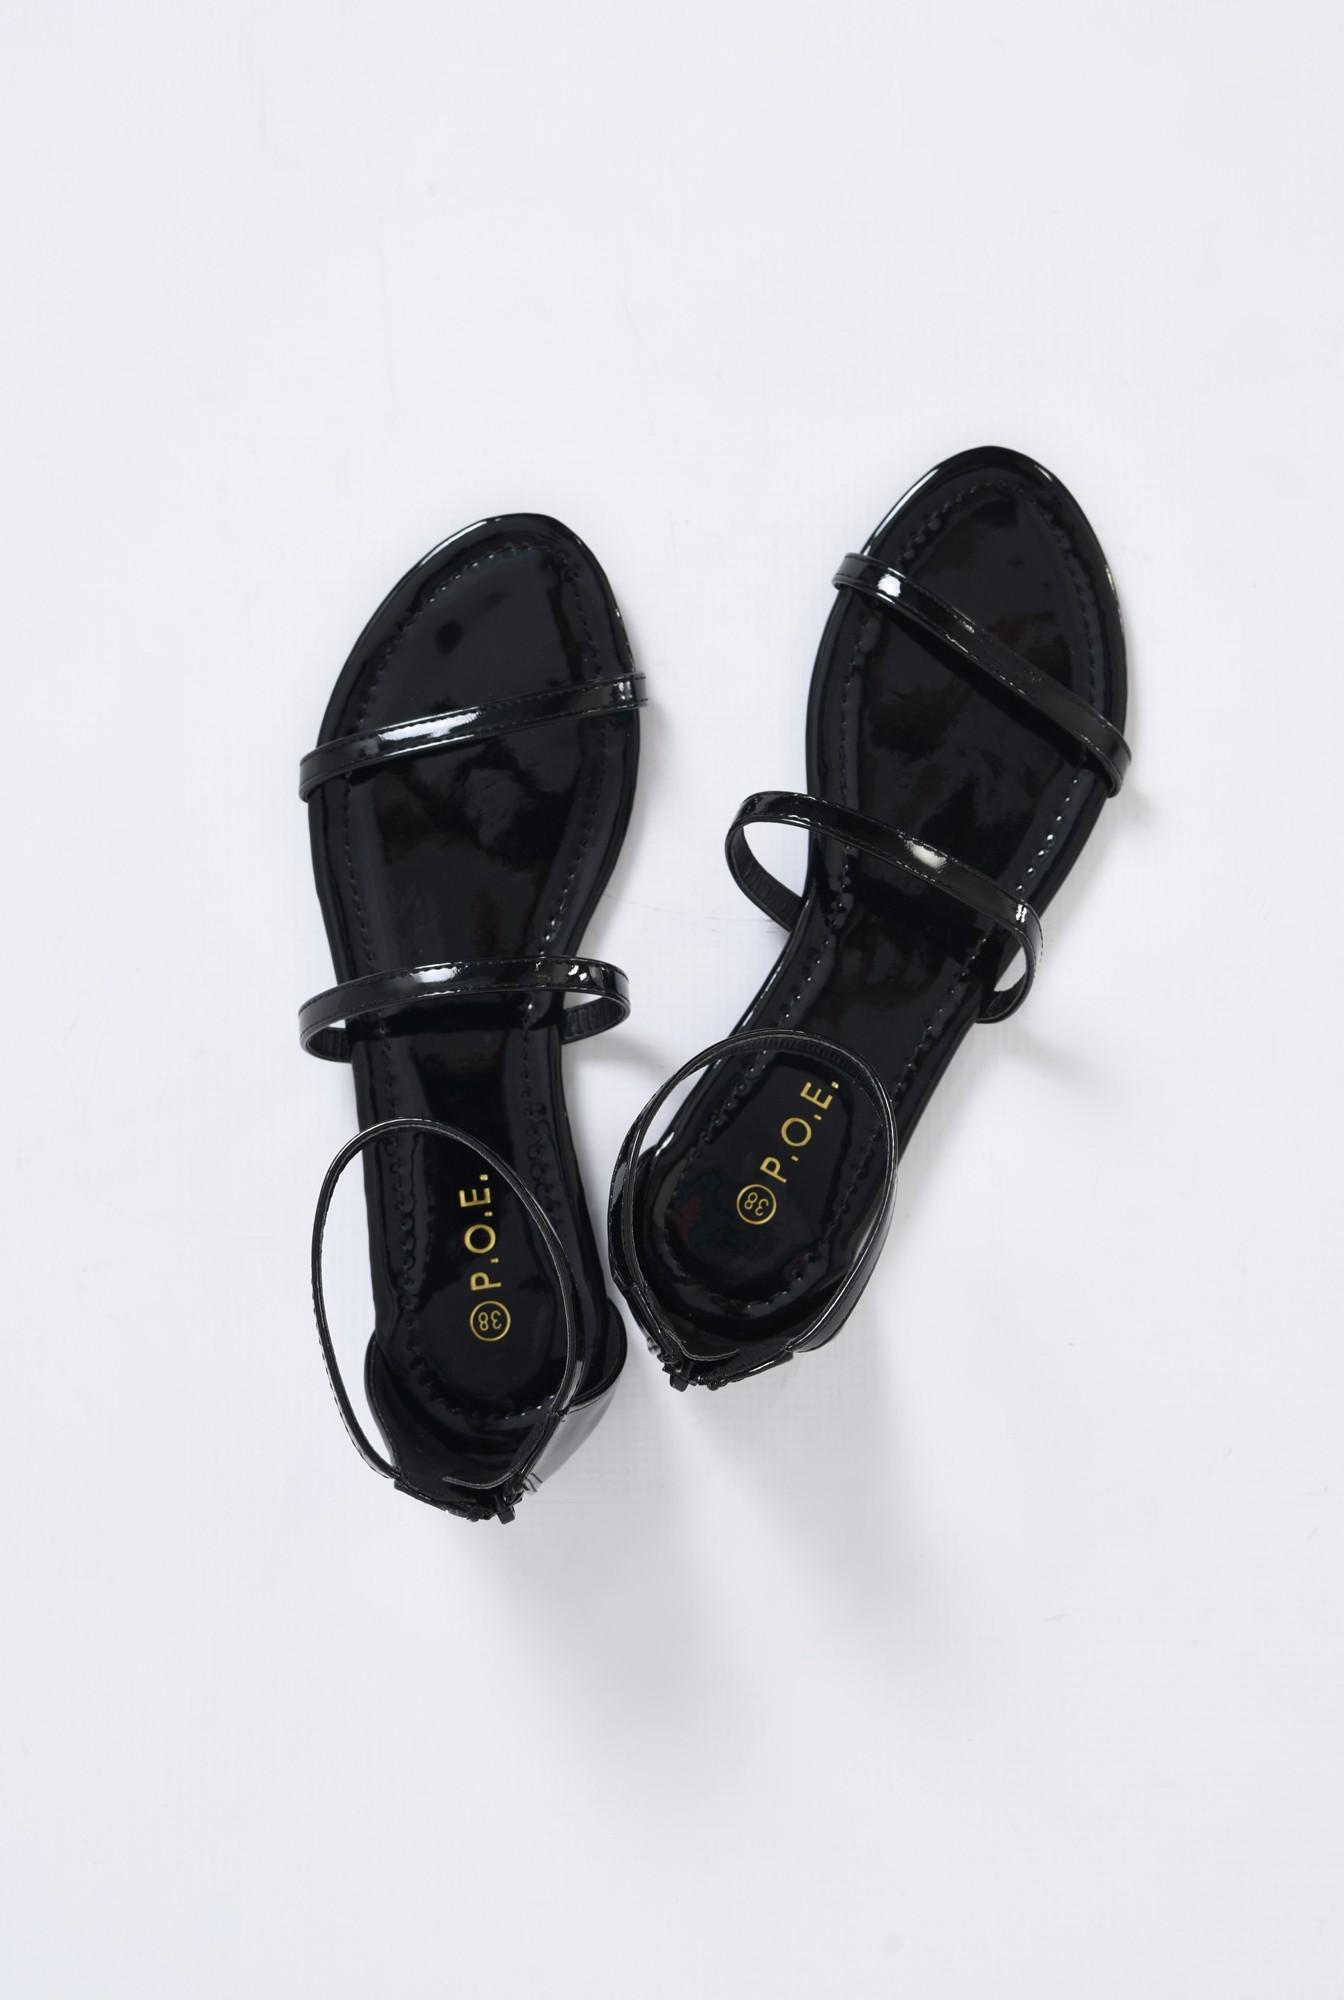 3 - sandale casual, cu talpa joasa, barete subtiri